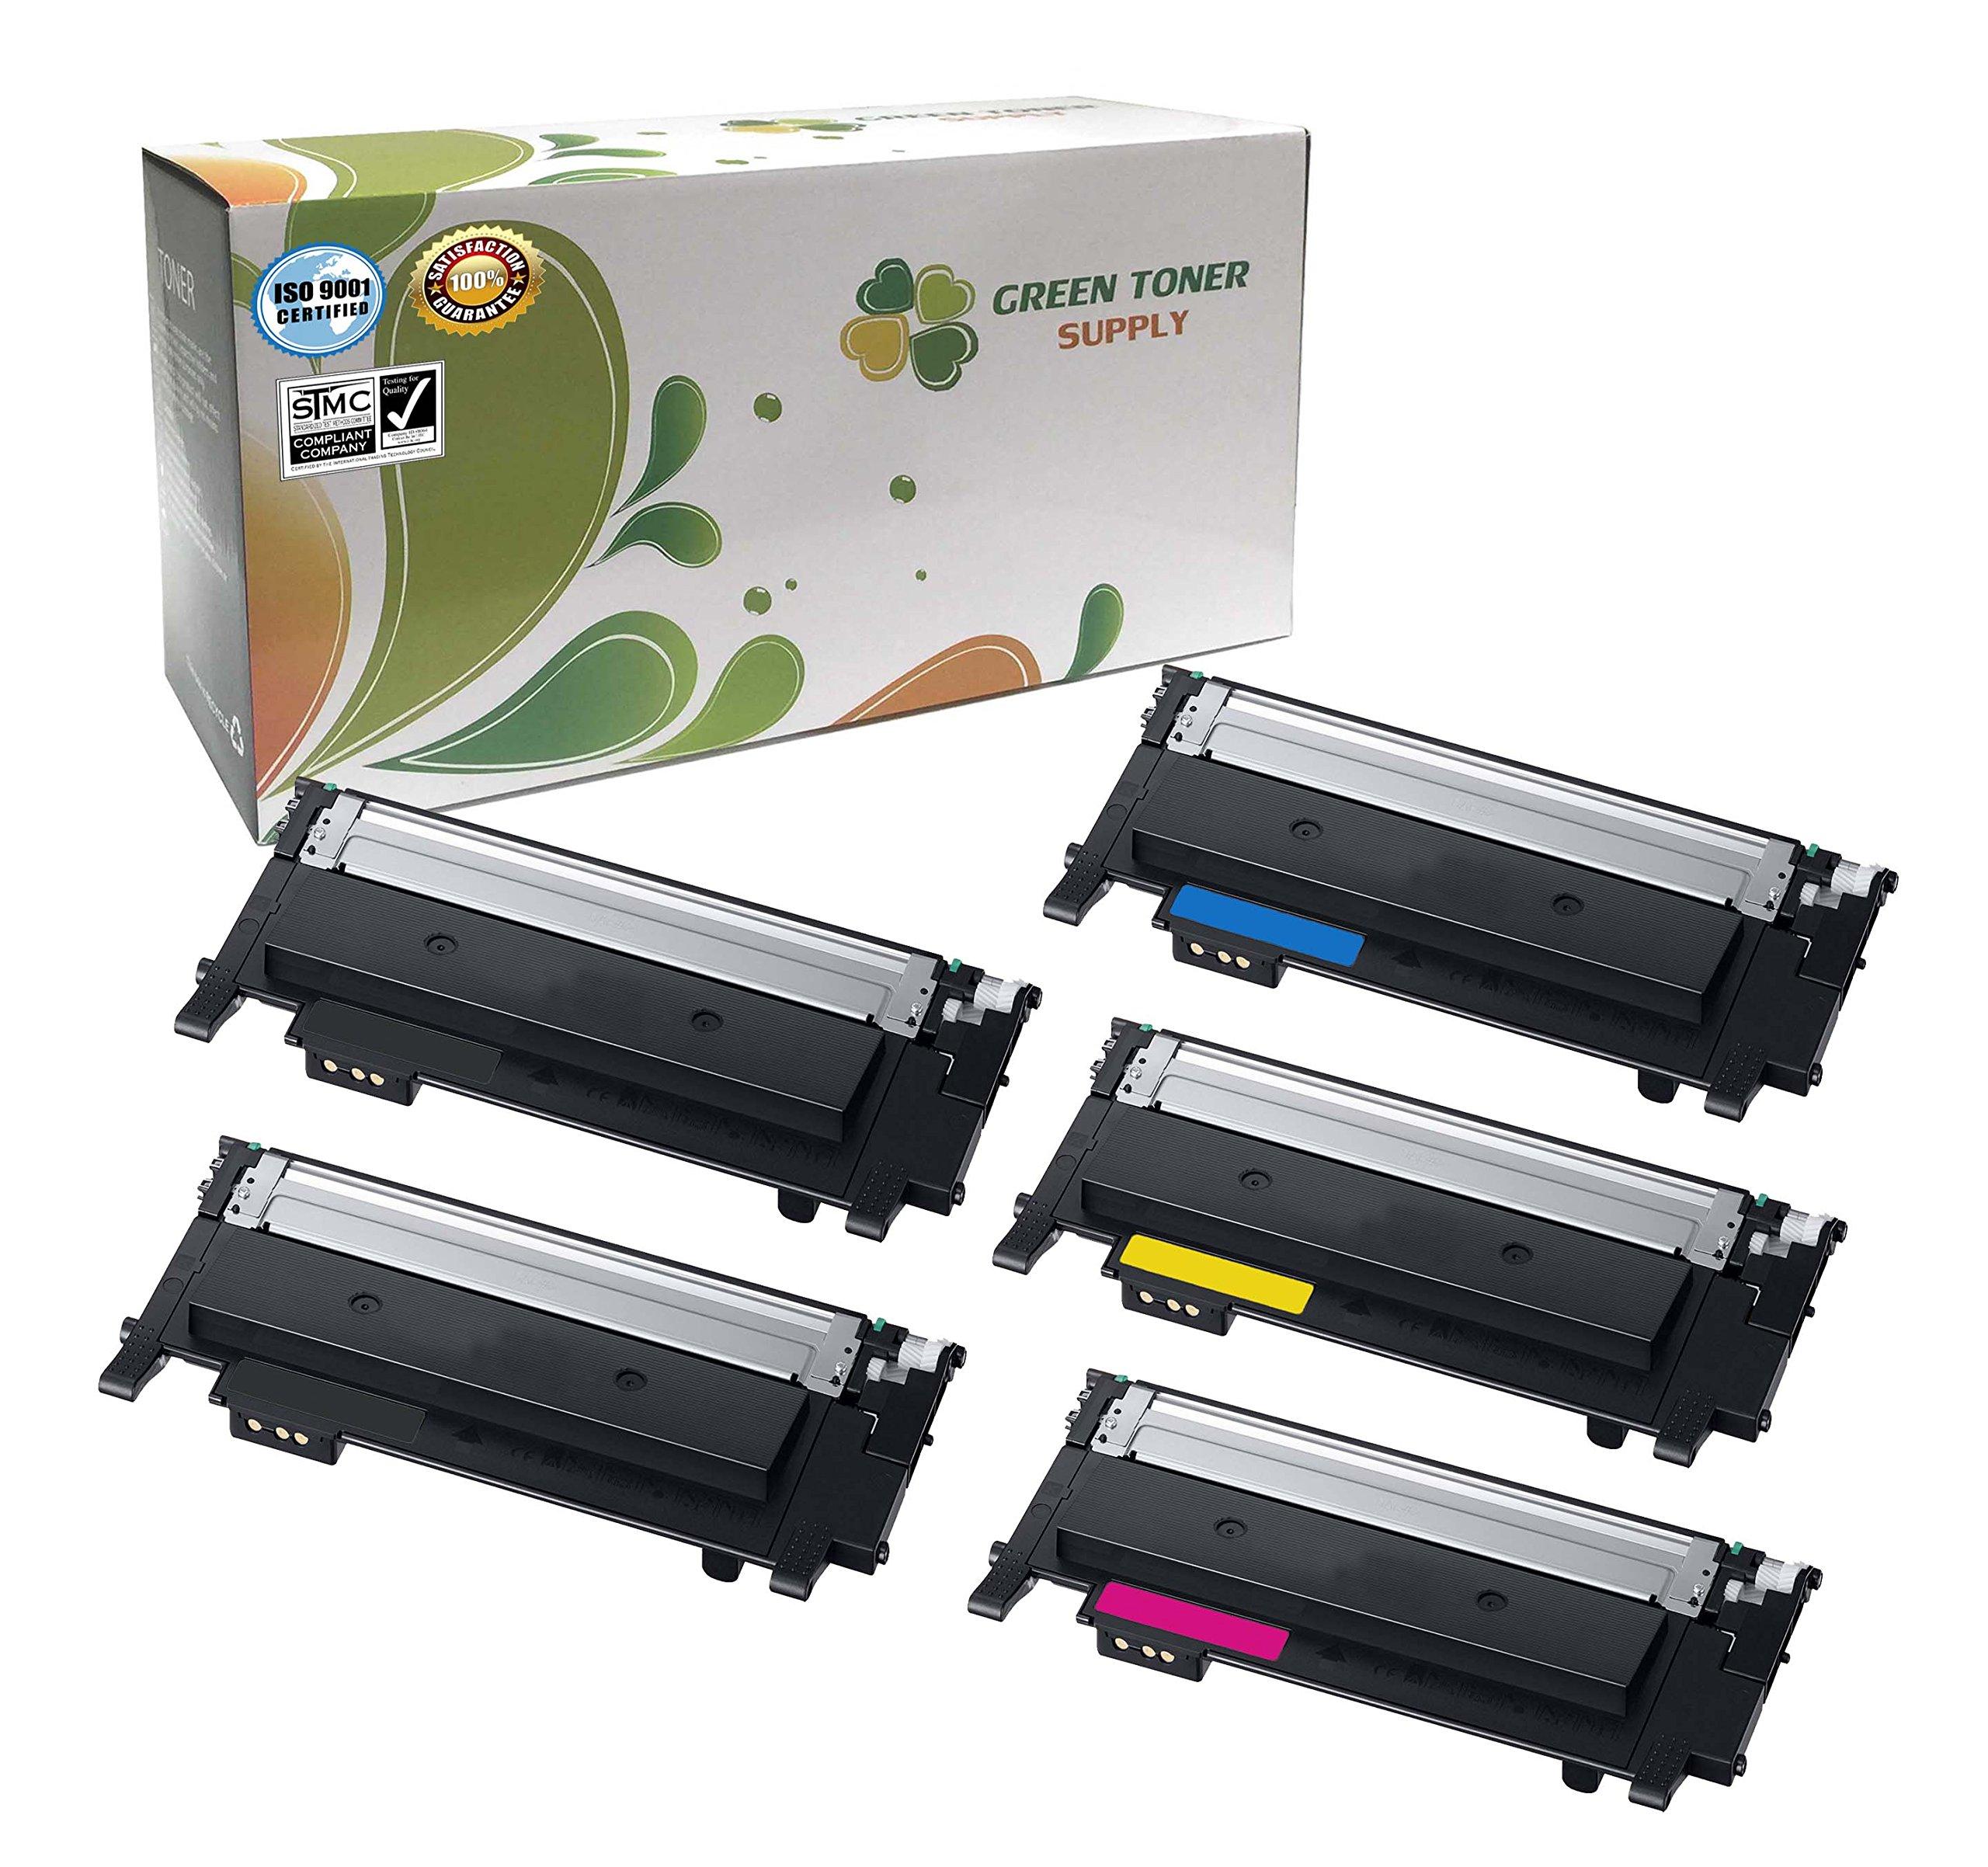 Green Toner Supply (TM) New Compatible [Samsung CLT-K404S,CLT-C404S,CLT-Y404S,CLT-M404S] 5 Color LaserJet Toner Cartridges for Samsung Xpress C430,C430W,C480,C480W